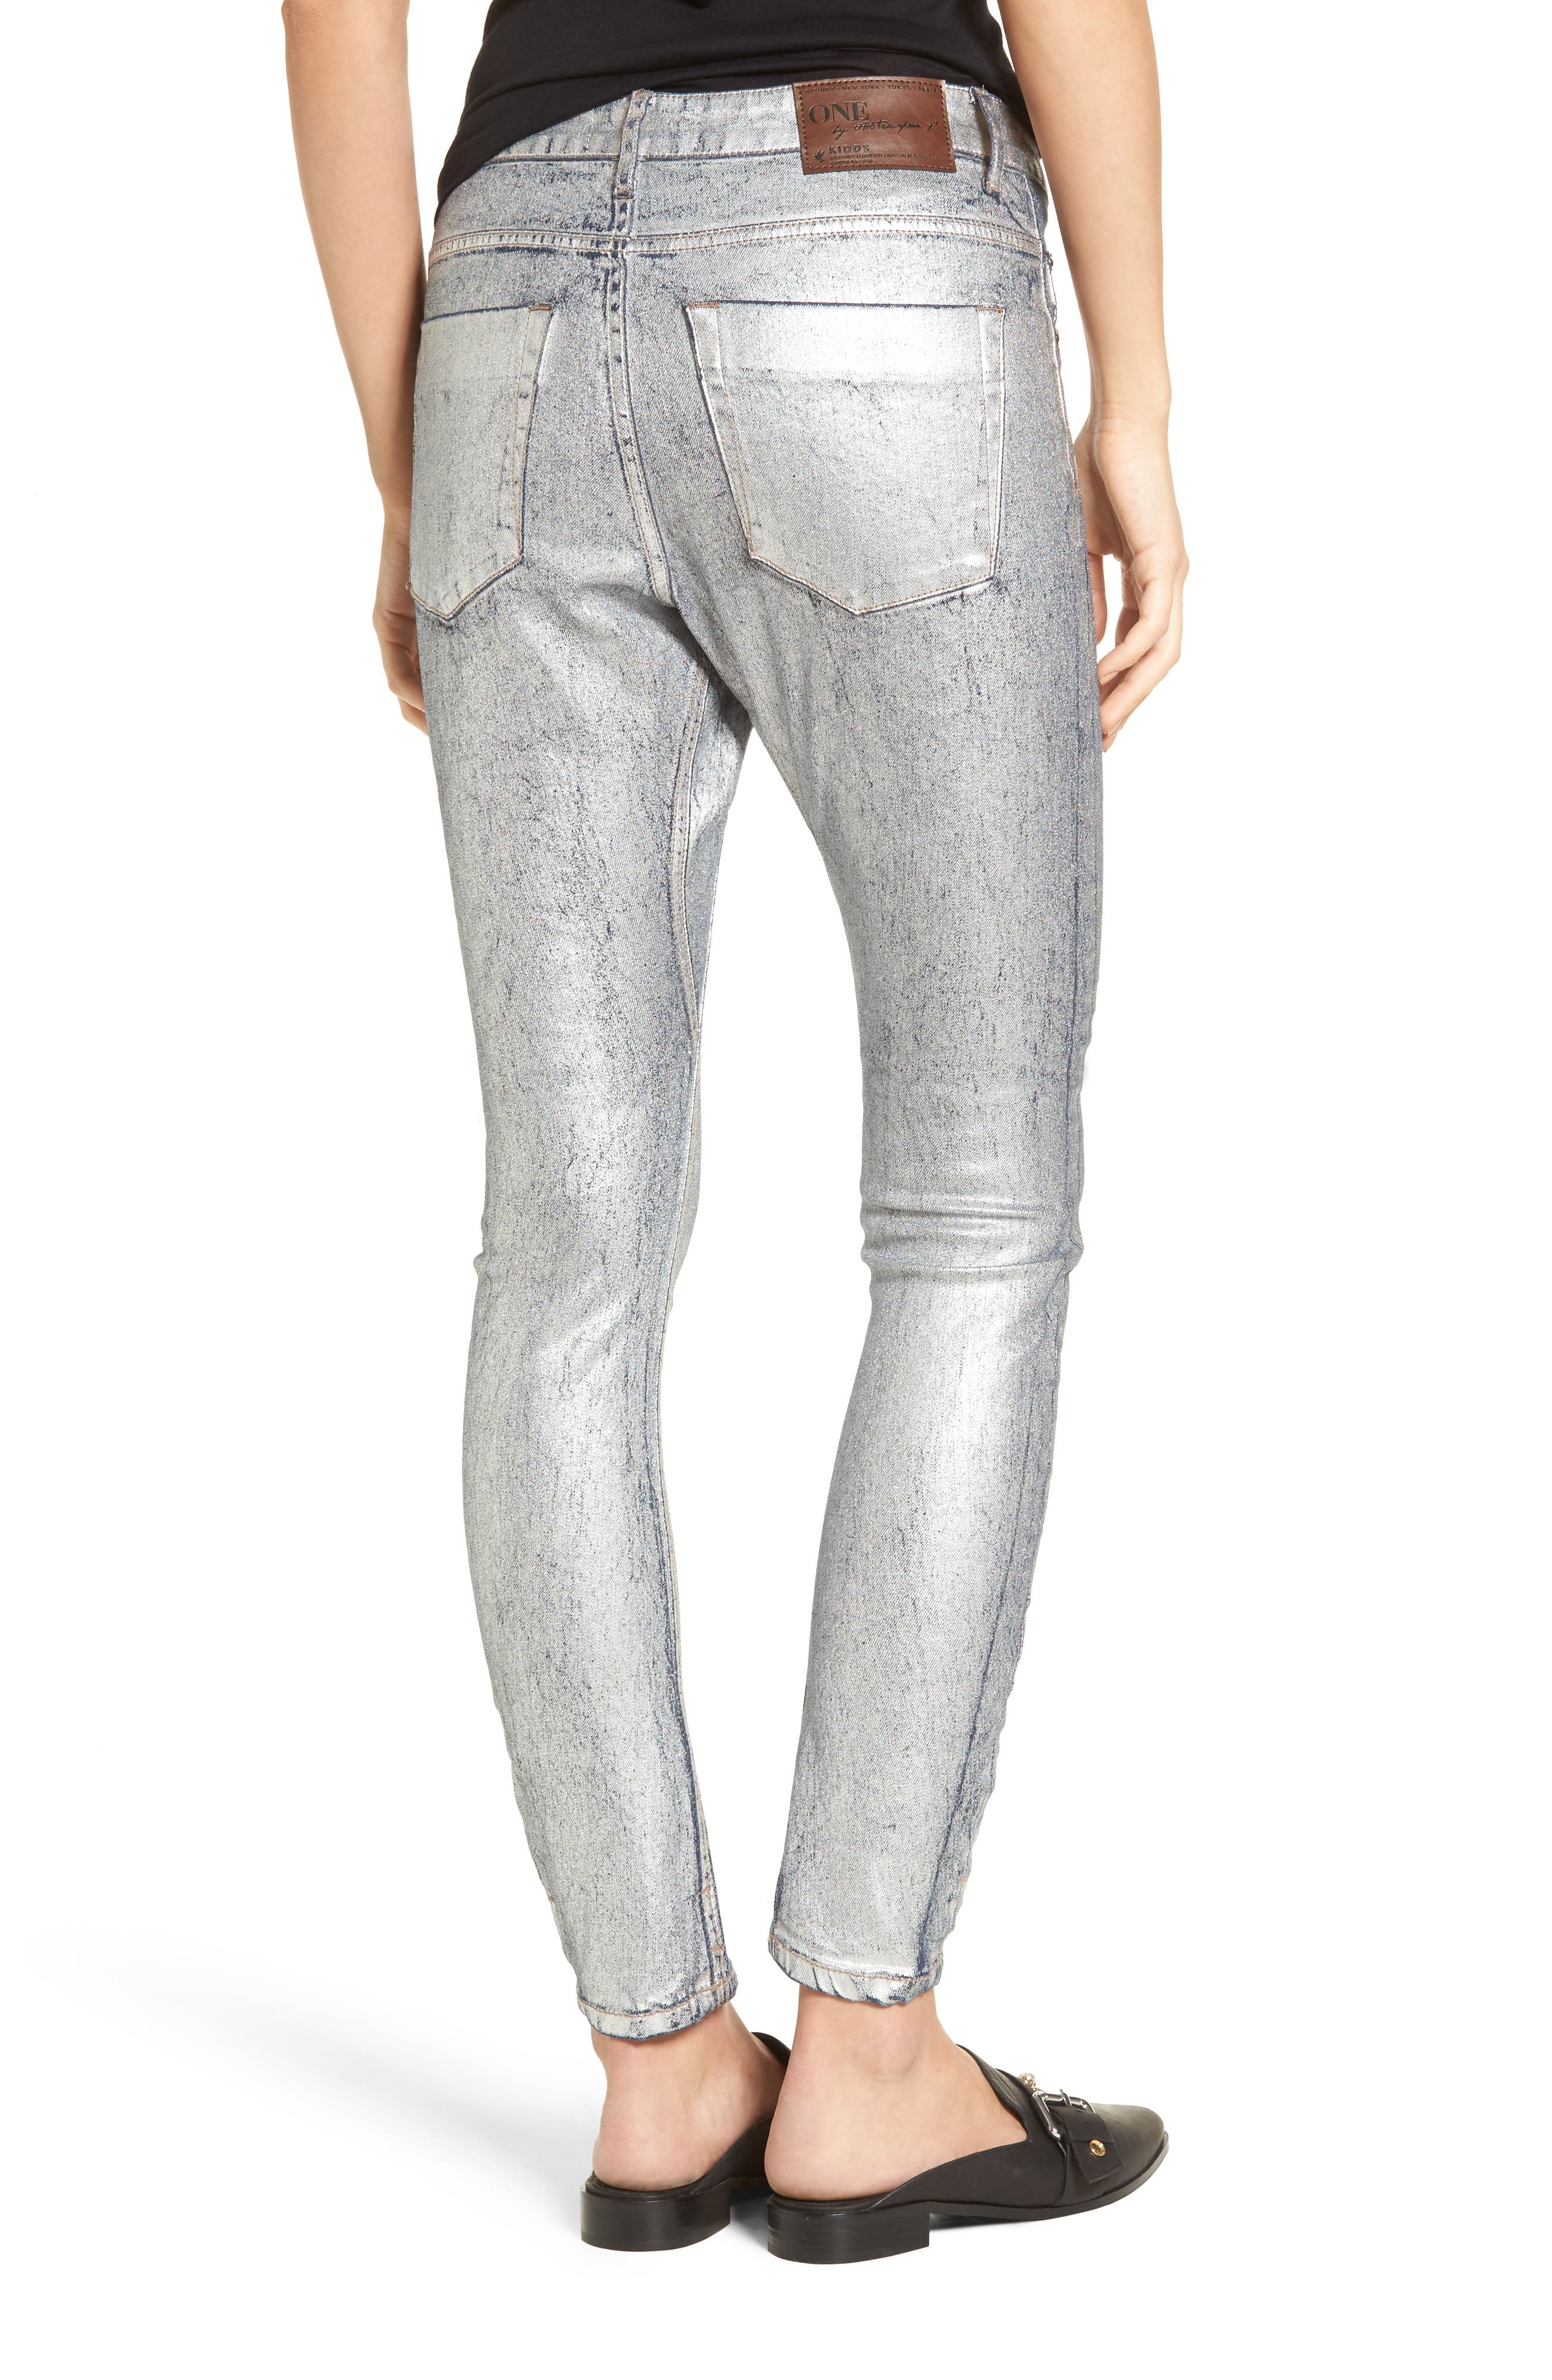 Kidds Metallic Drop Crotch Skinny Jeans,                             Alternate thumbnail 2, color,                             Nightshade